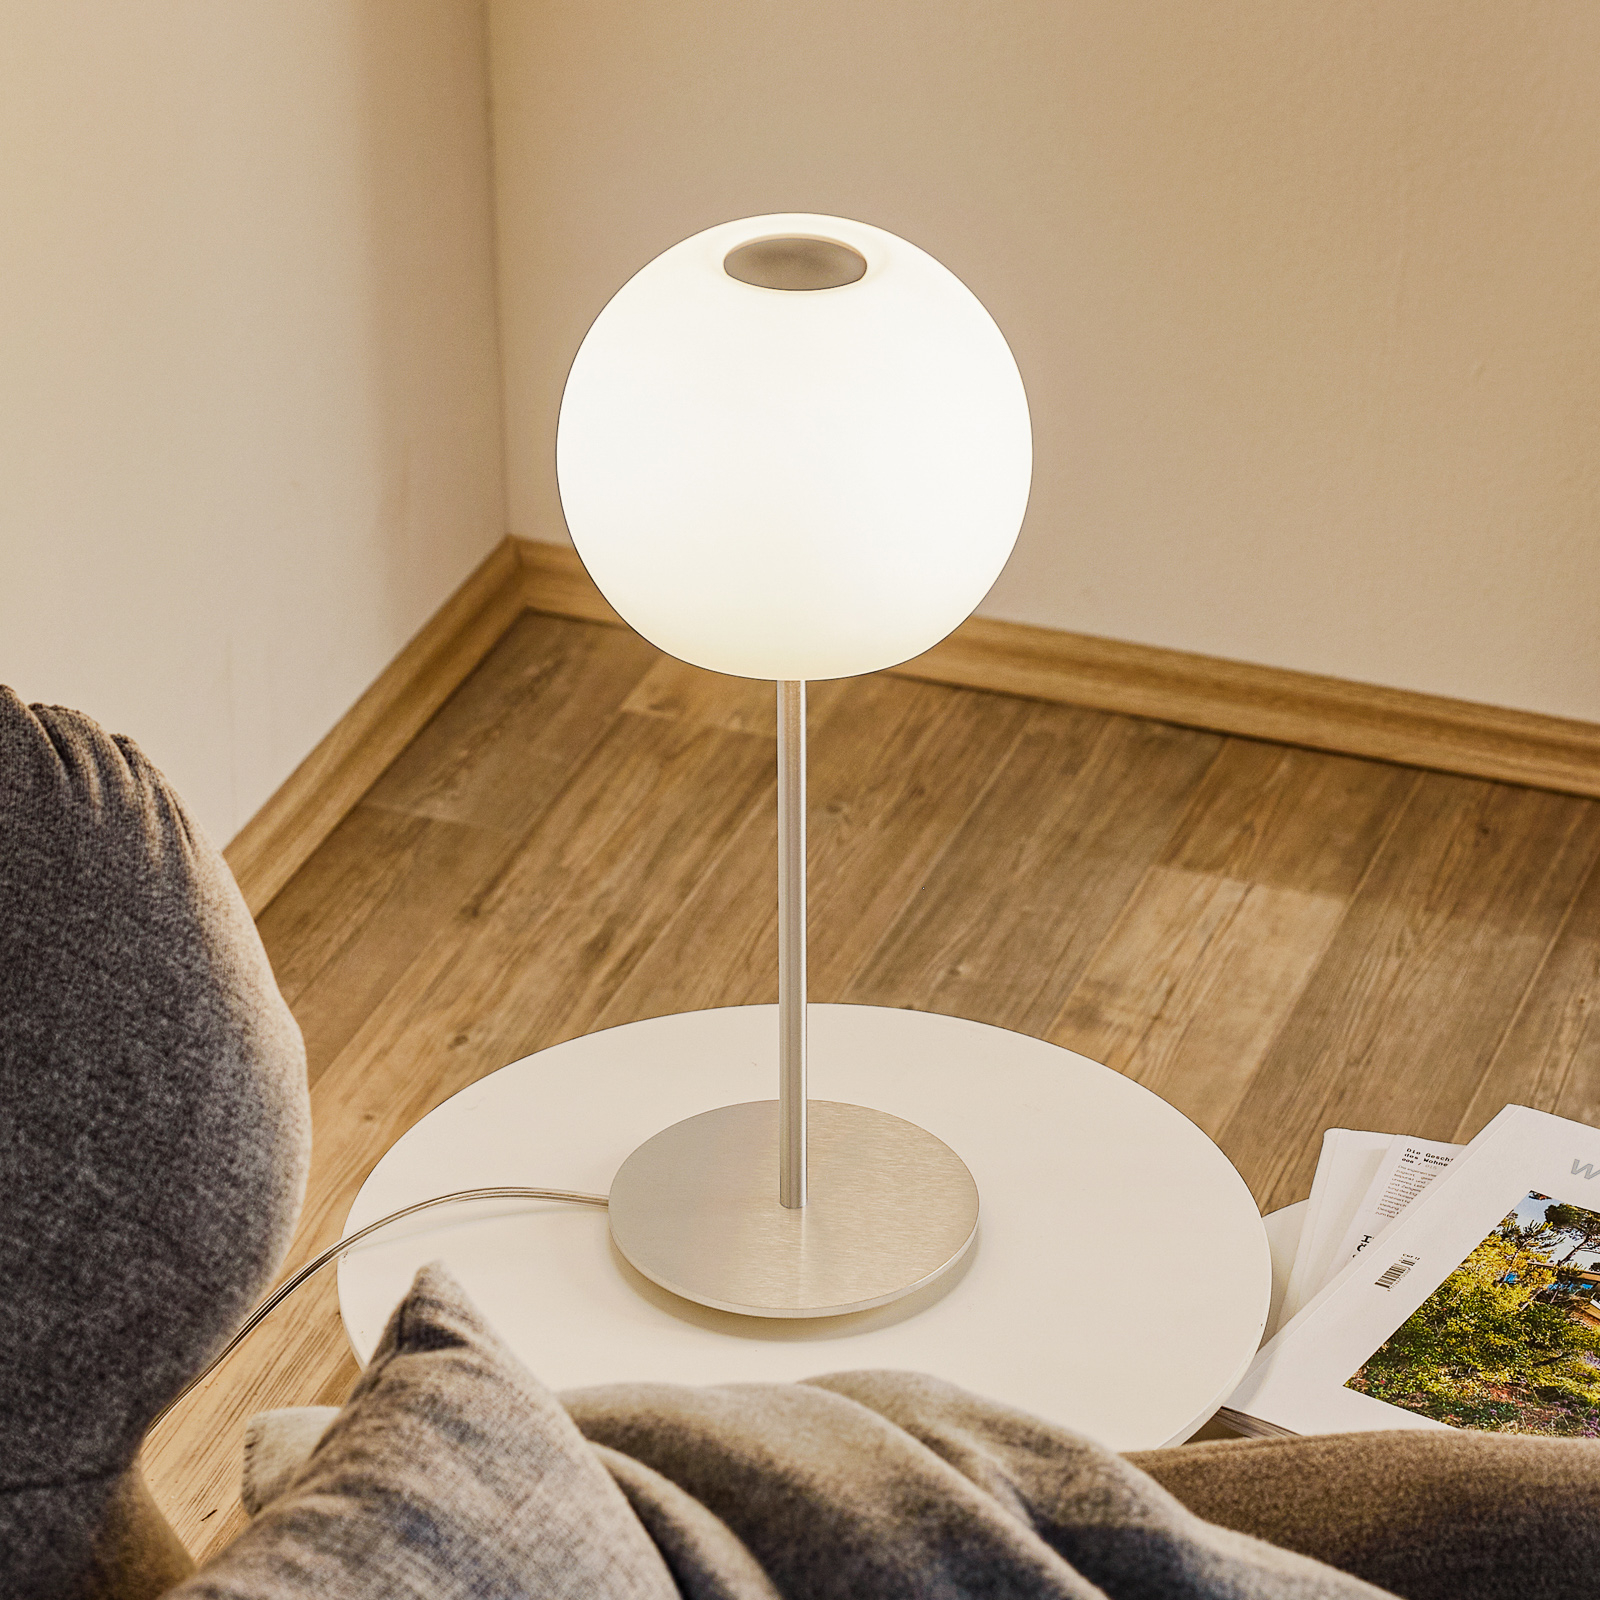 Casablanca Ball stolová lampa, výška 49 cm_2000312_1